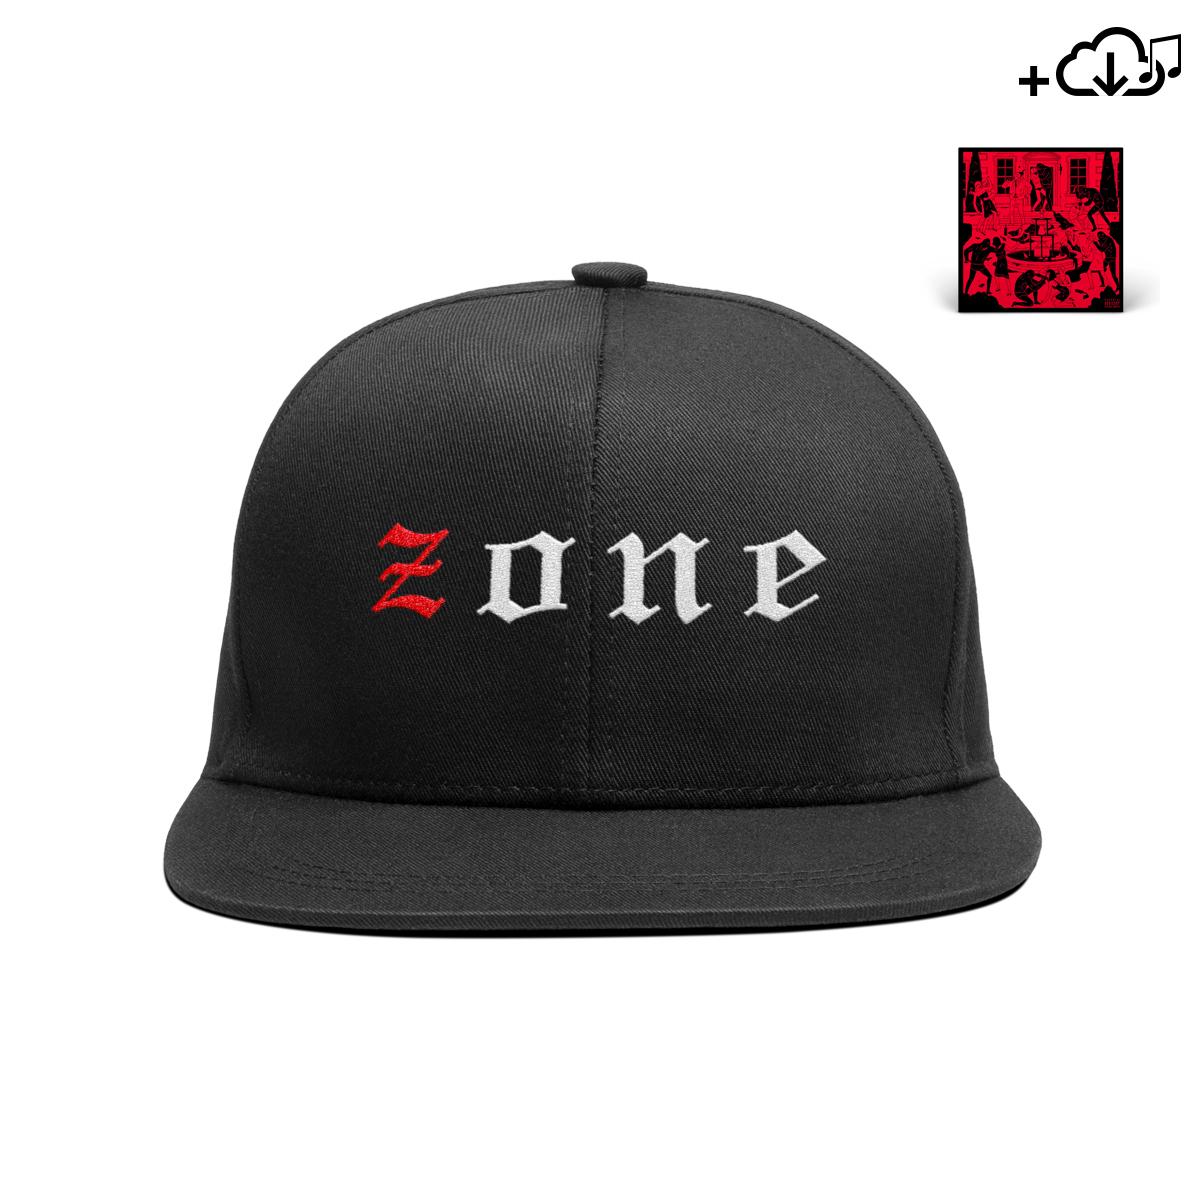 ZONE Snapback + Poison Digital Download